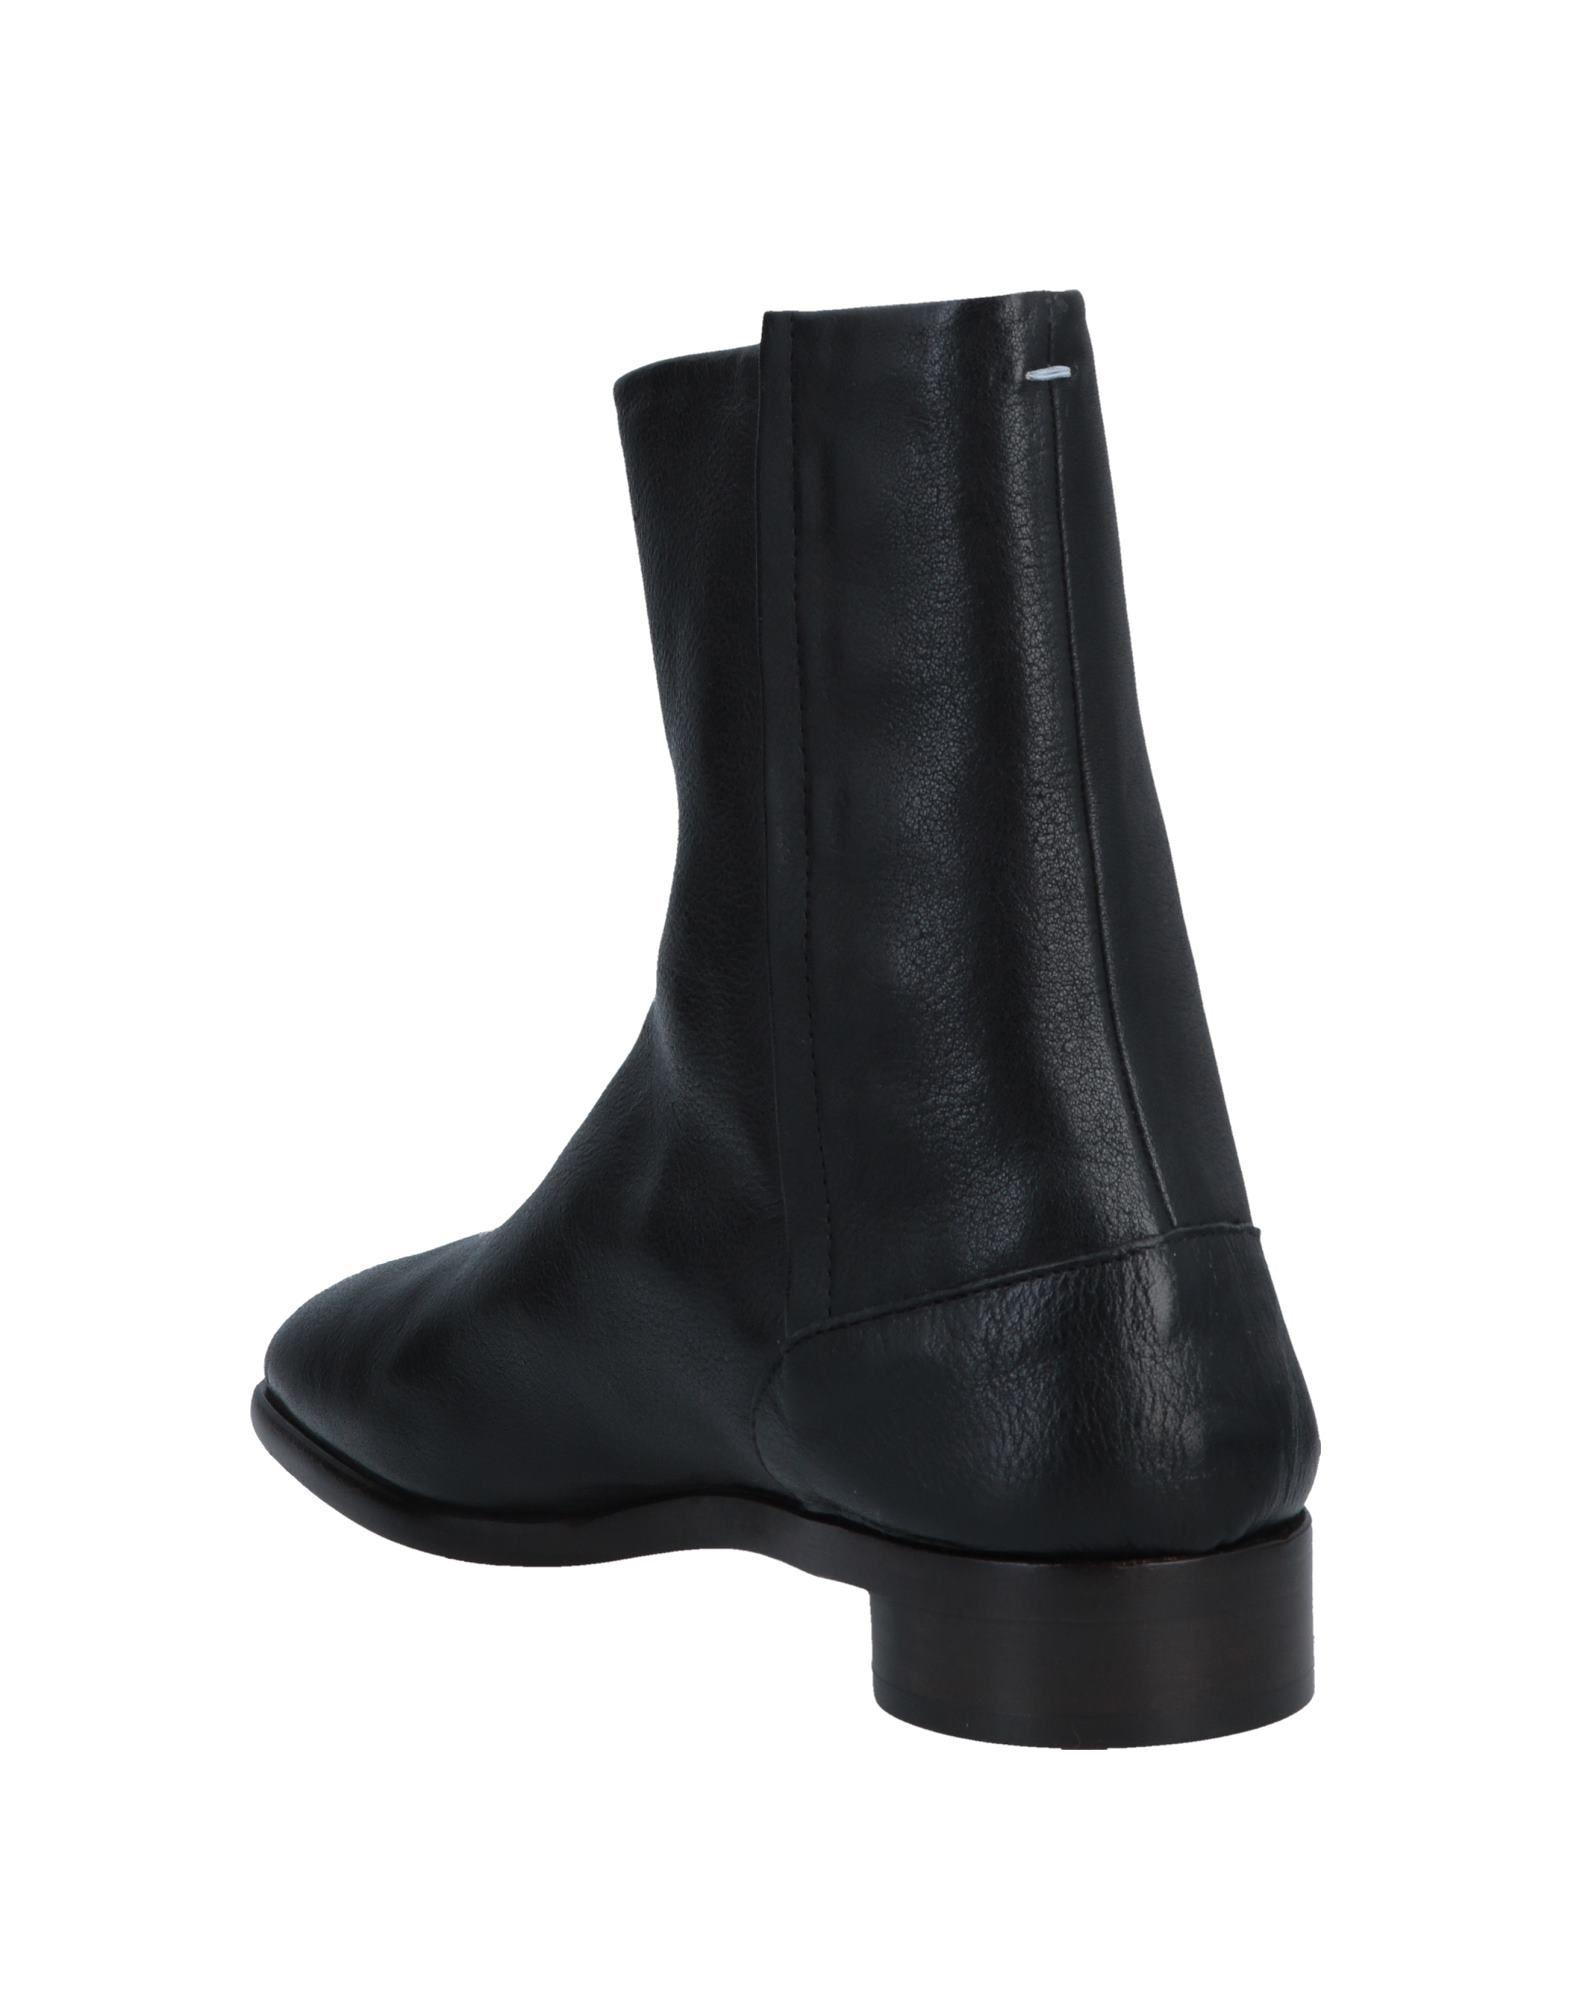 f82b1ee228d7d Lyst - Maison Margiela Ankle Boots in Black for Men